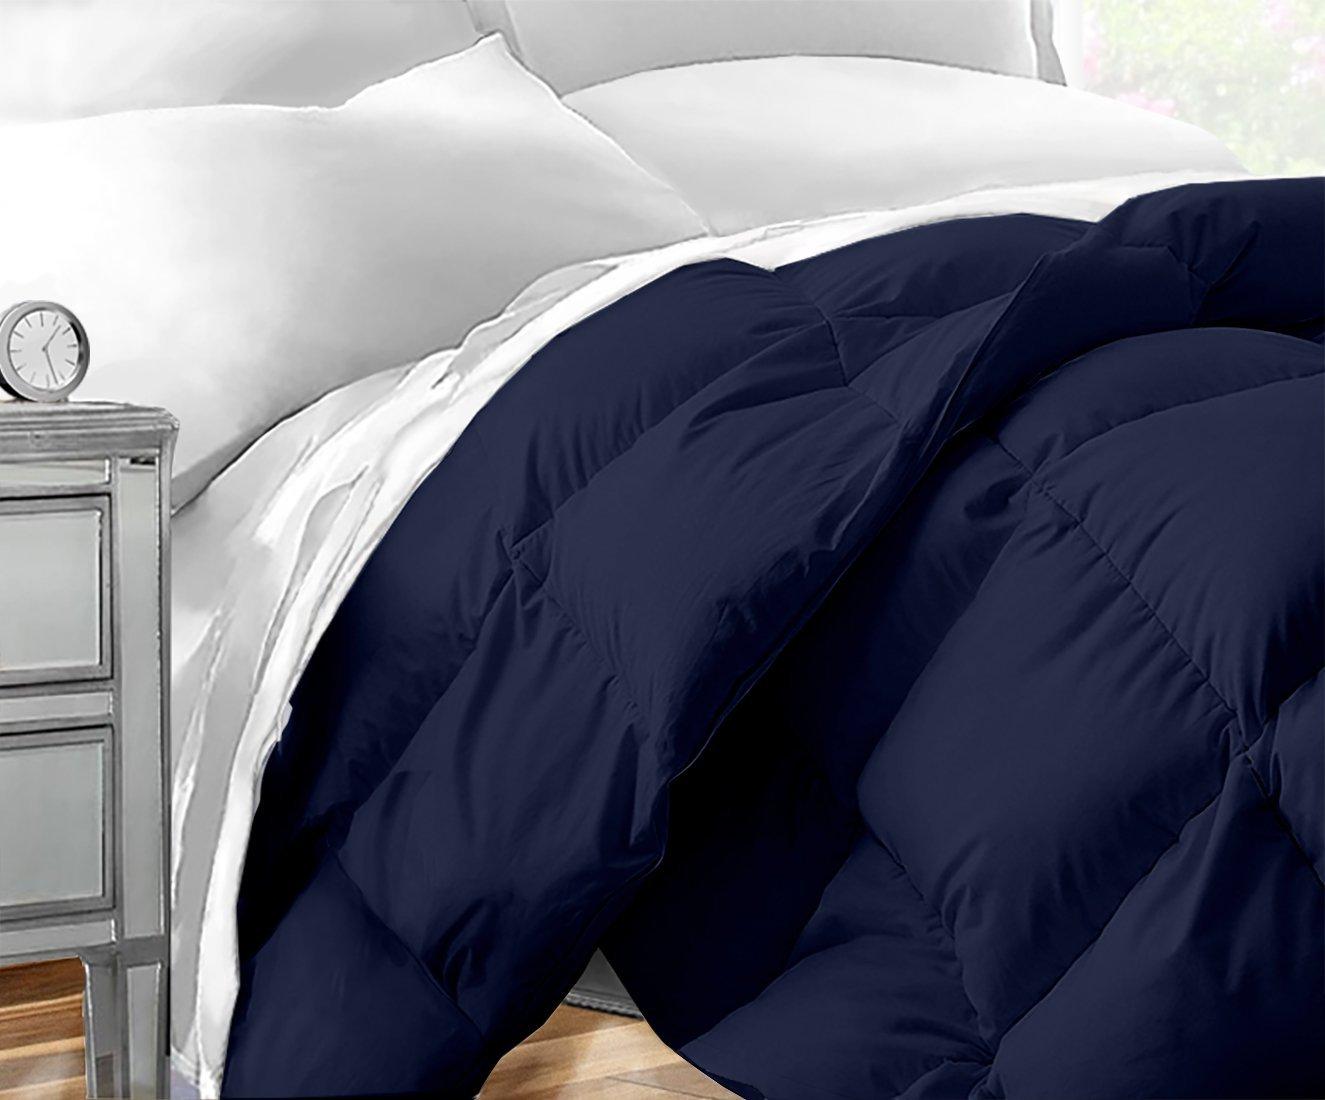 Sleep Restoration Down Alternative Comforter 1400 Series - Best Hotel Quality Hypoallergenic Duvet Insert Bedding - Full/Queen - Navy